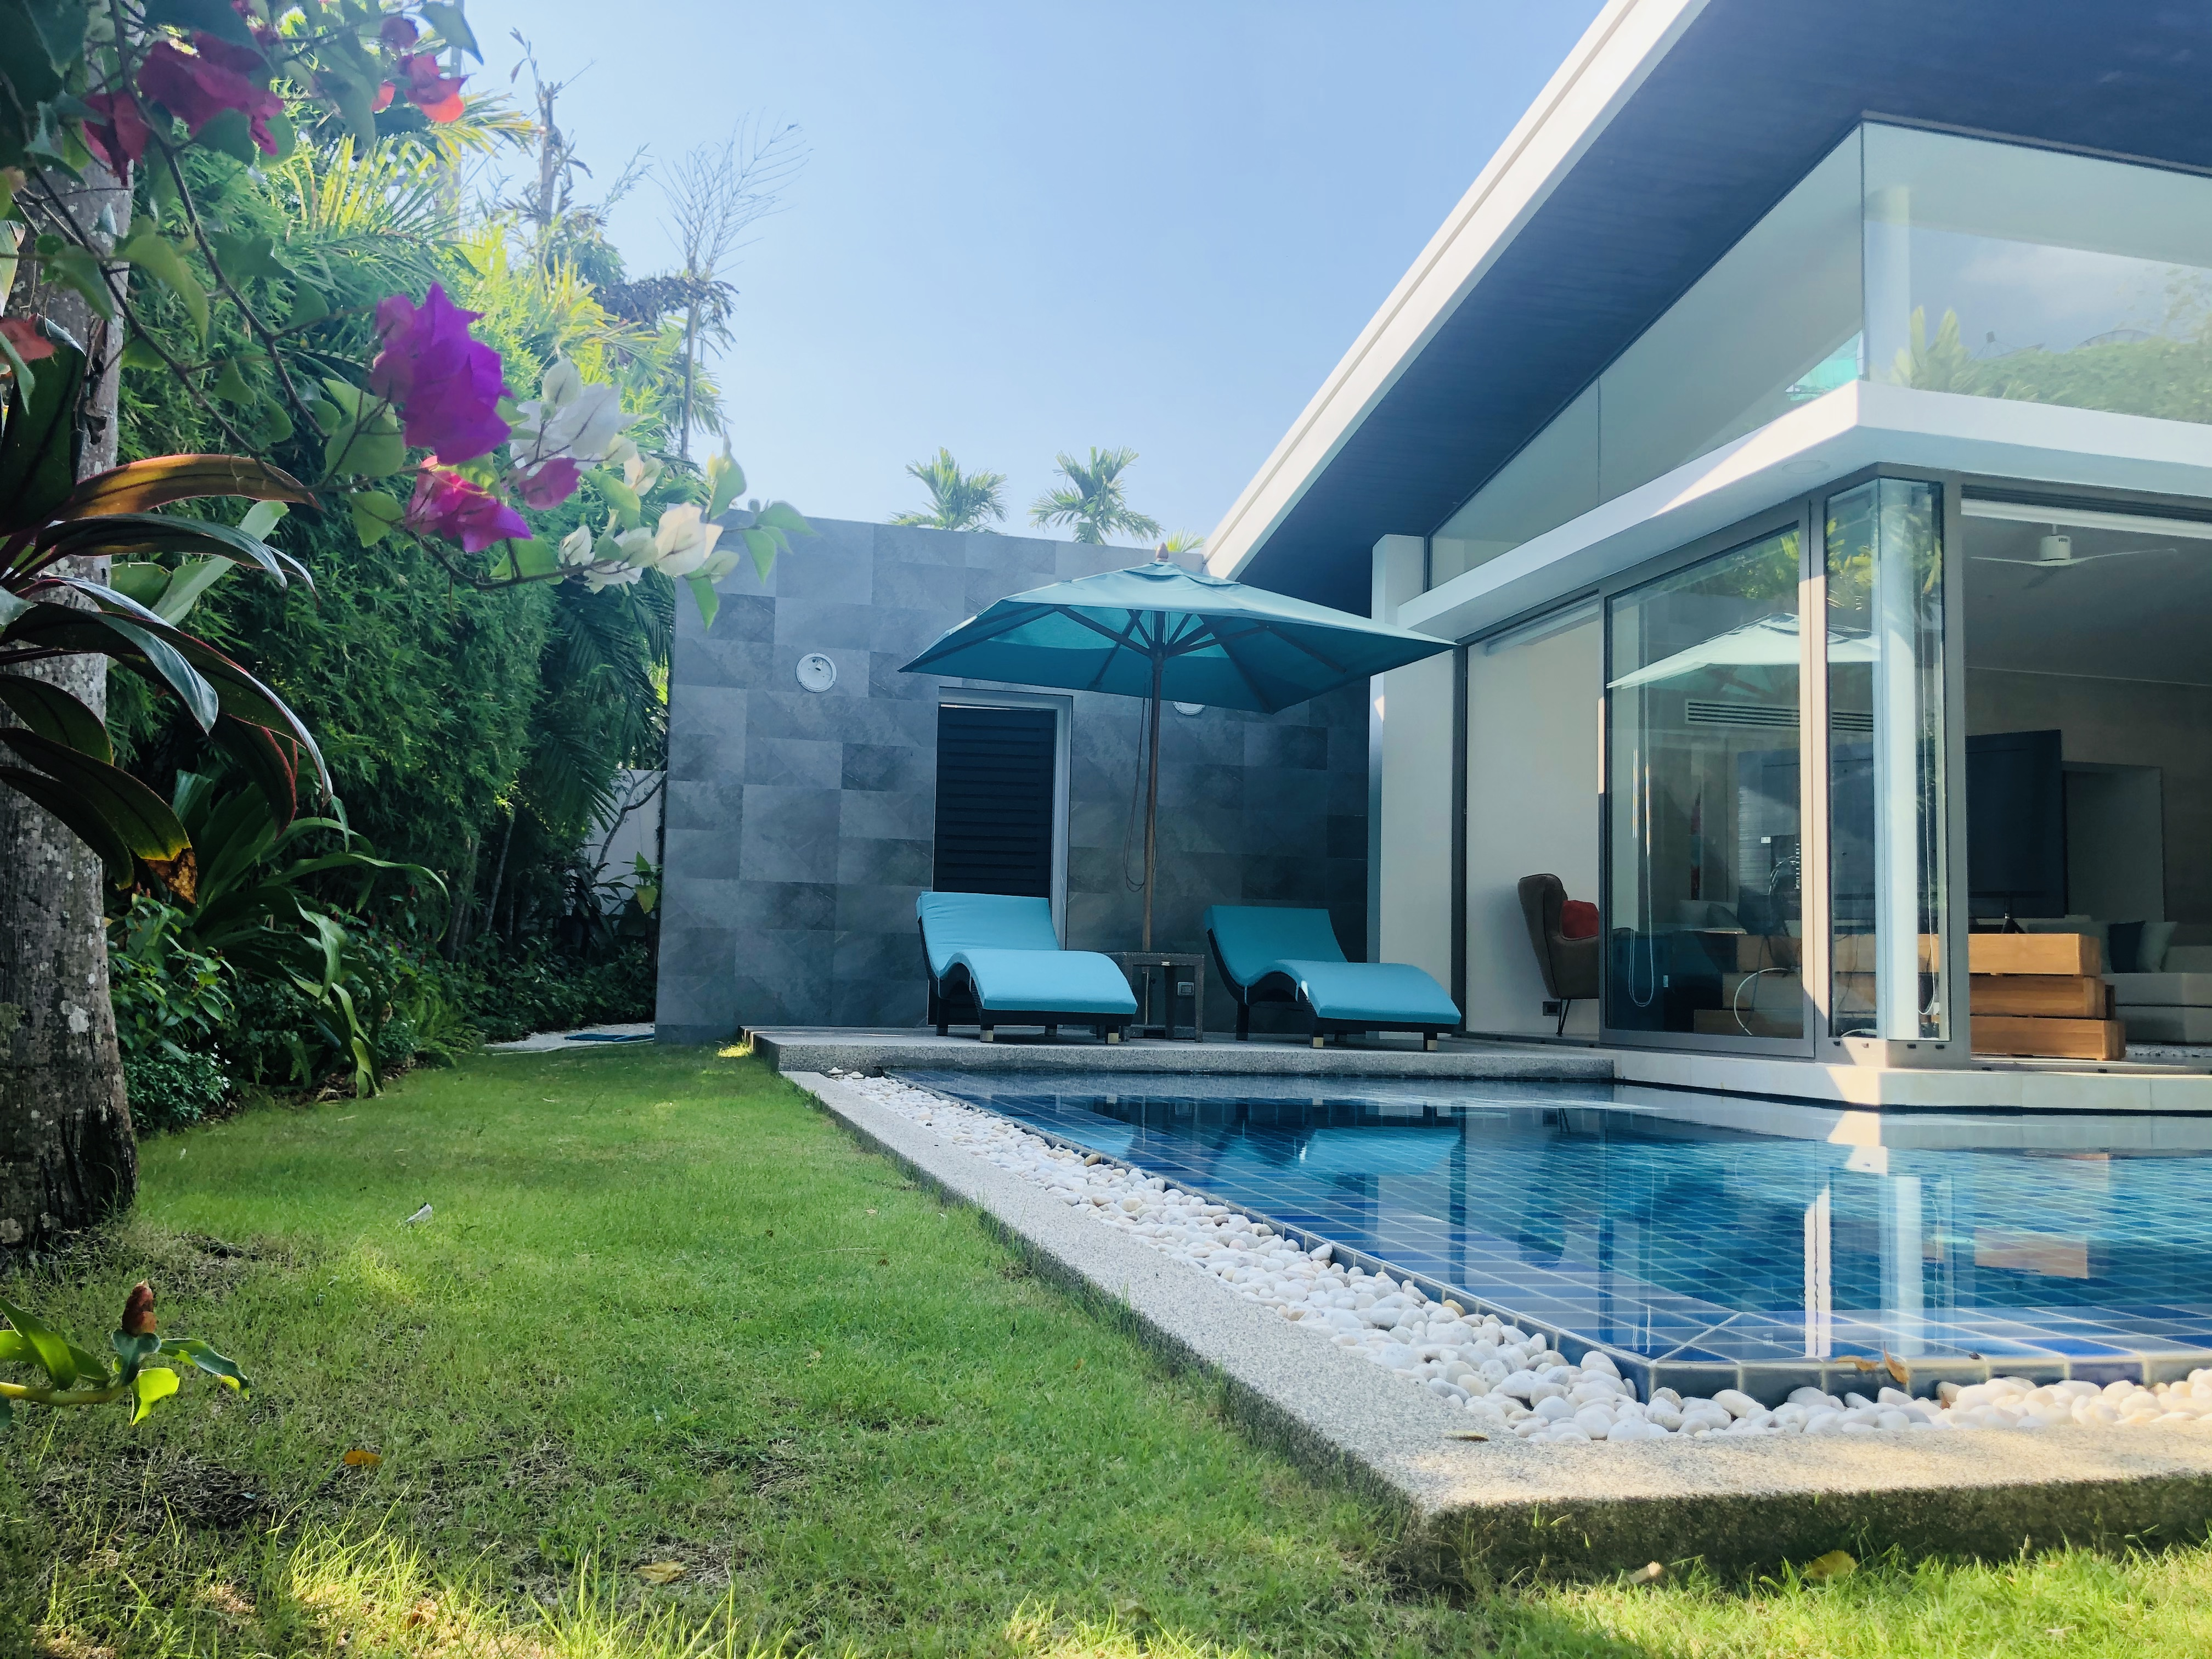 Villa 3 bedroom for sale in Cherng talay ID: CG-051